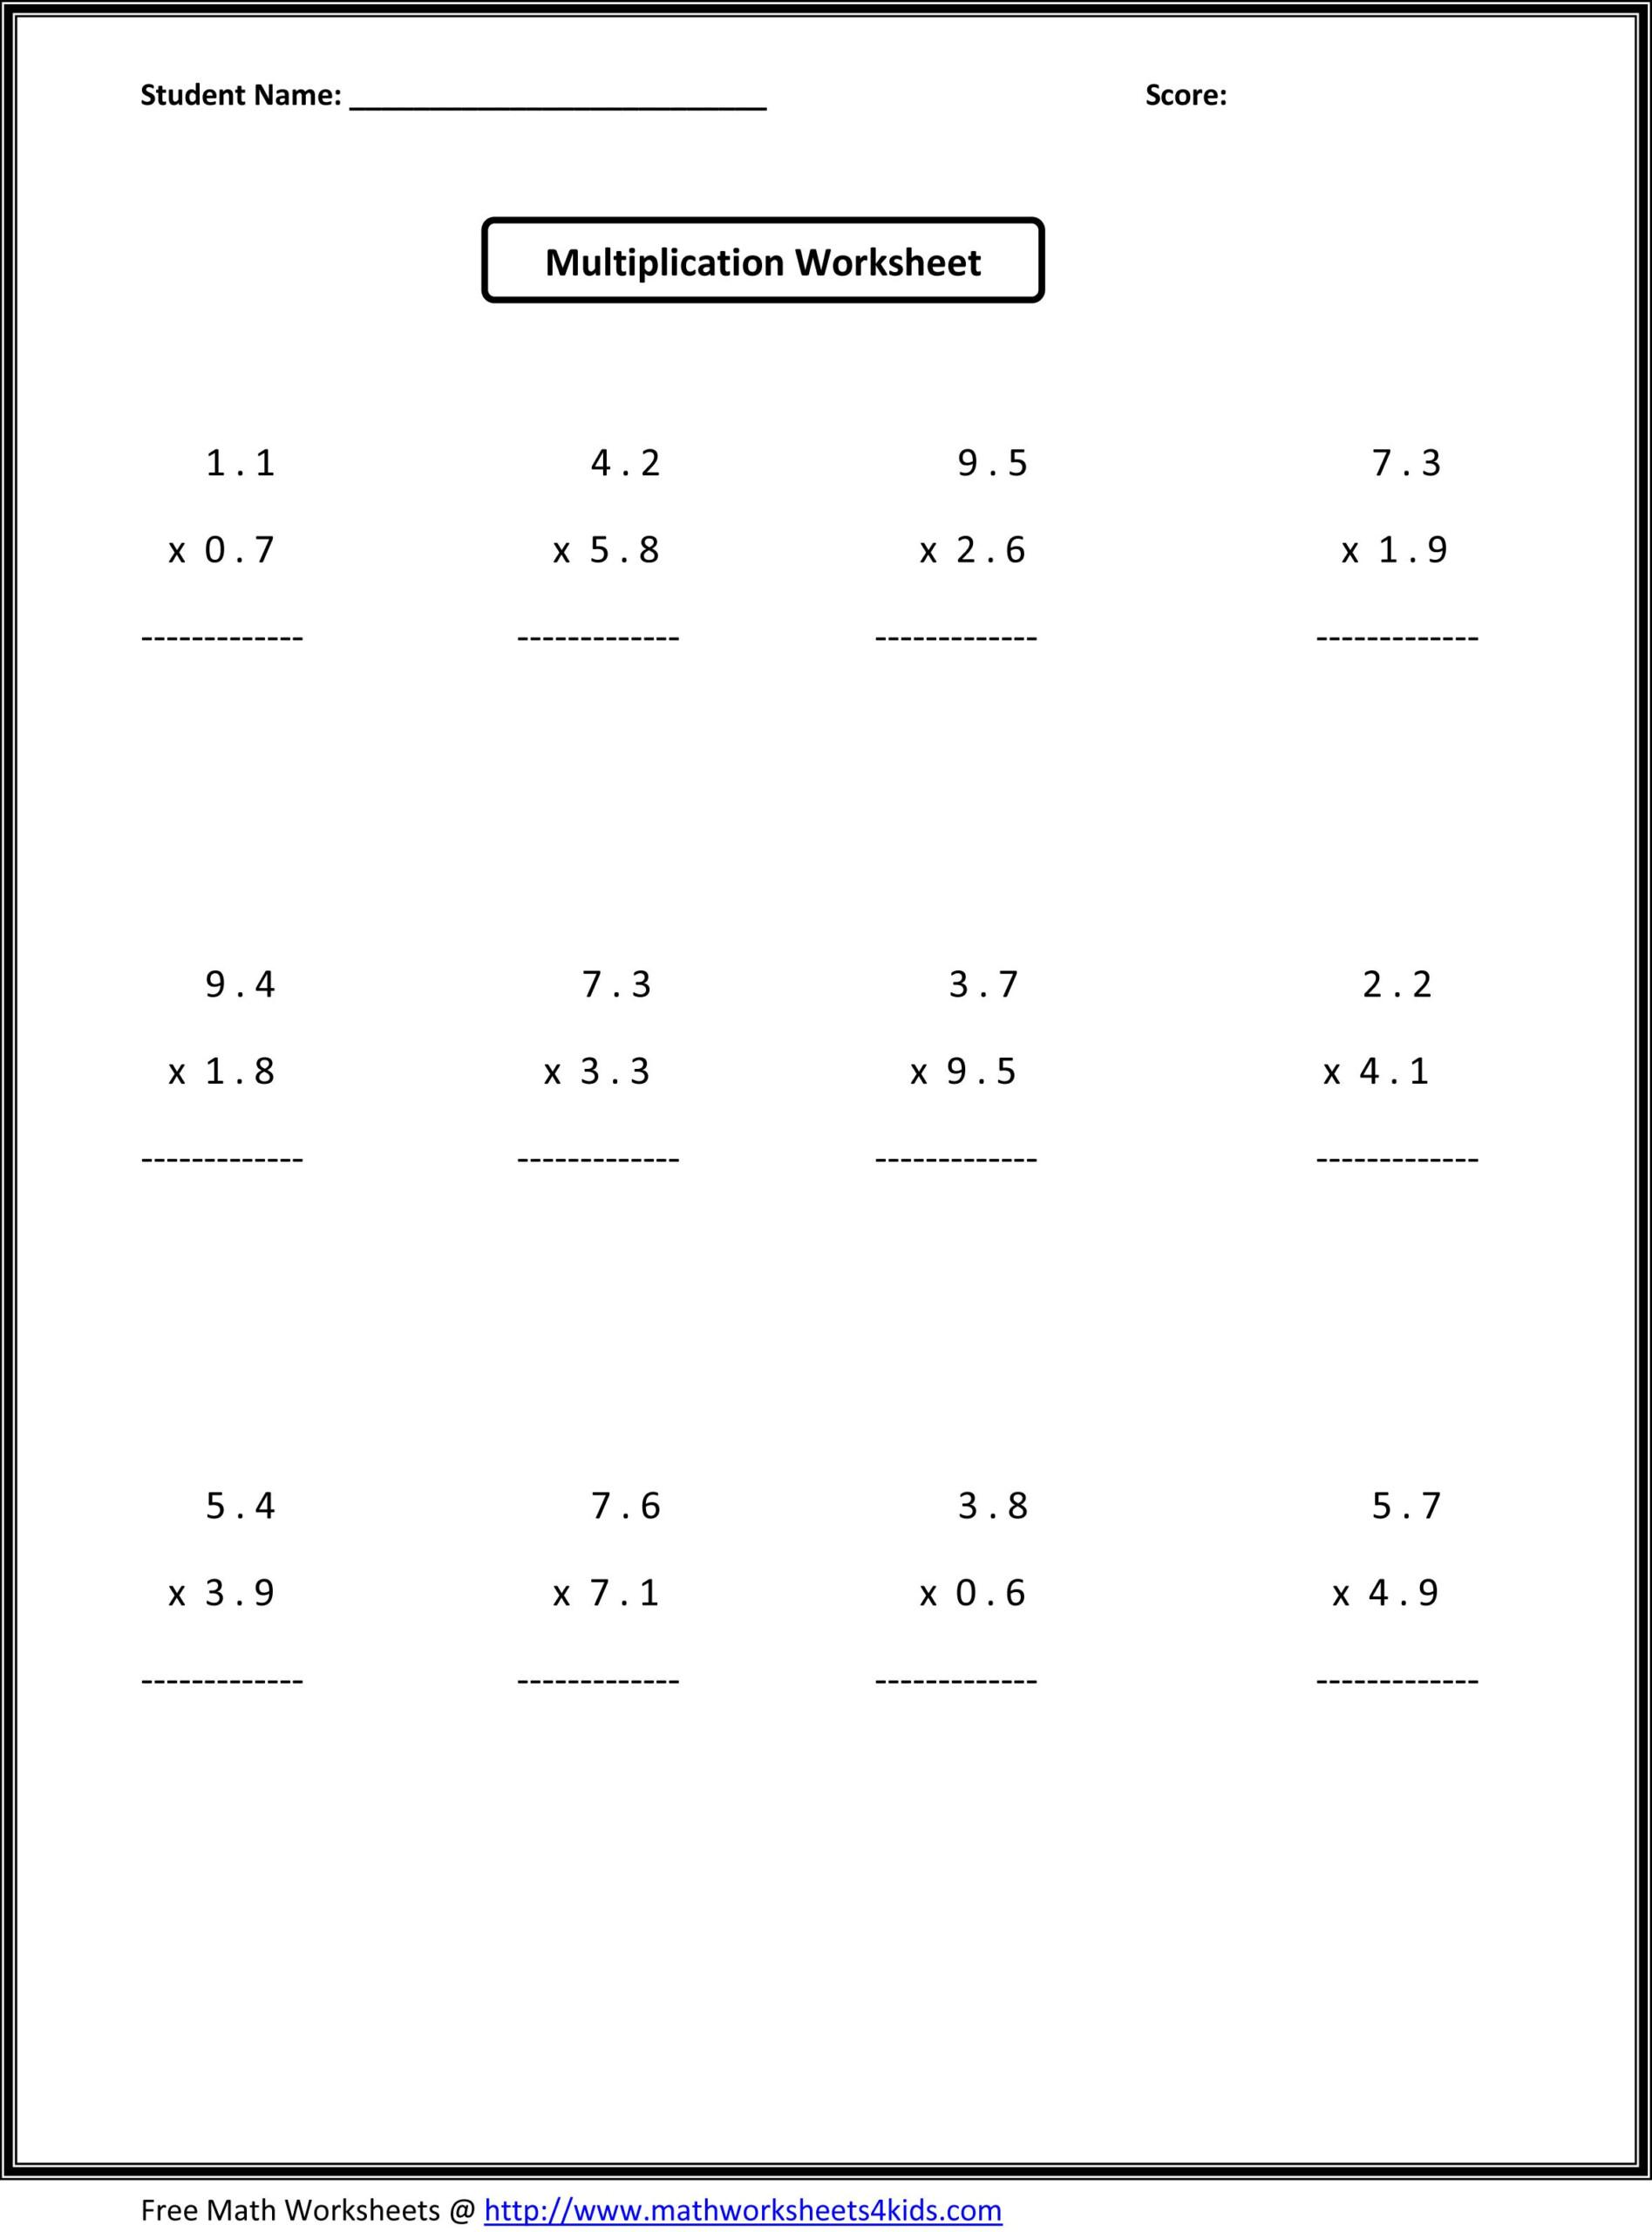 6Th Grade Math | 7Th Grade Math Worksheets, Kindergarten with Multiplication Worksheets 6 Grade